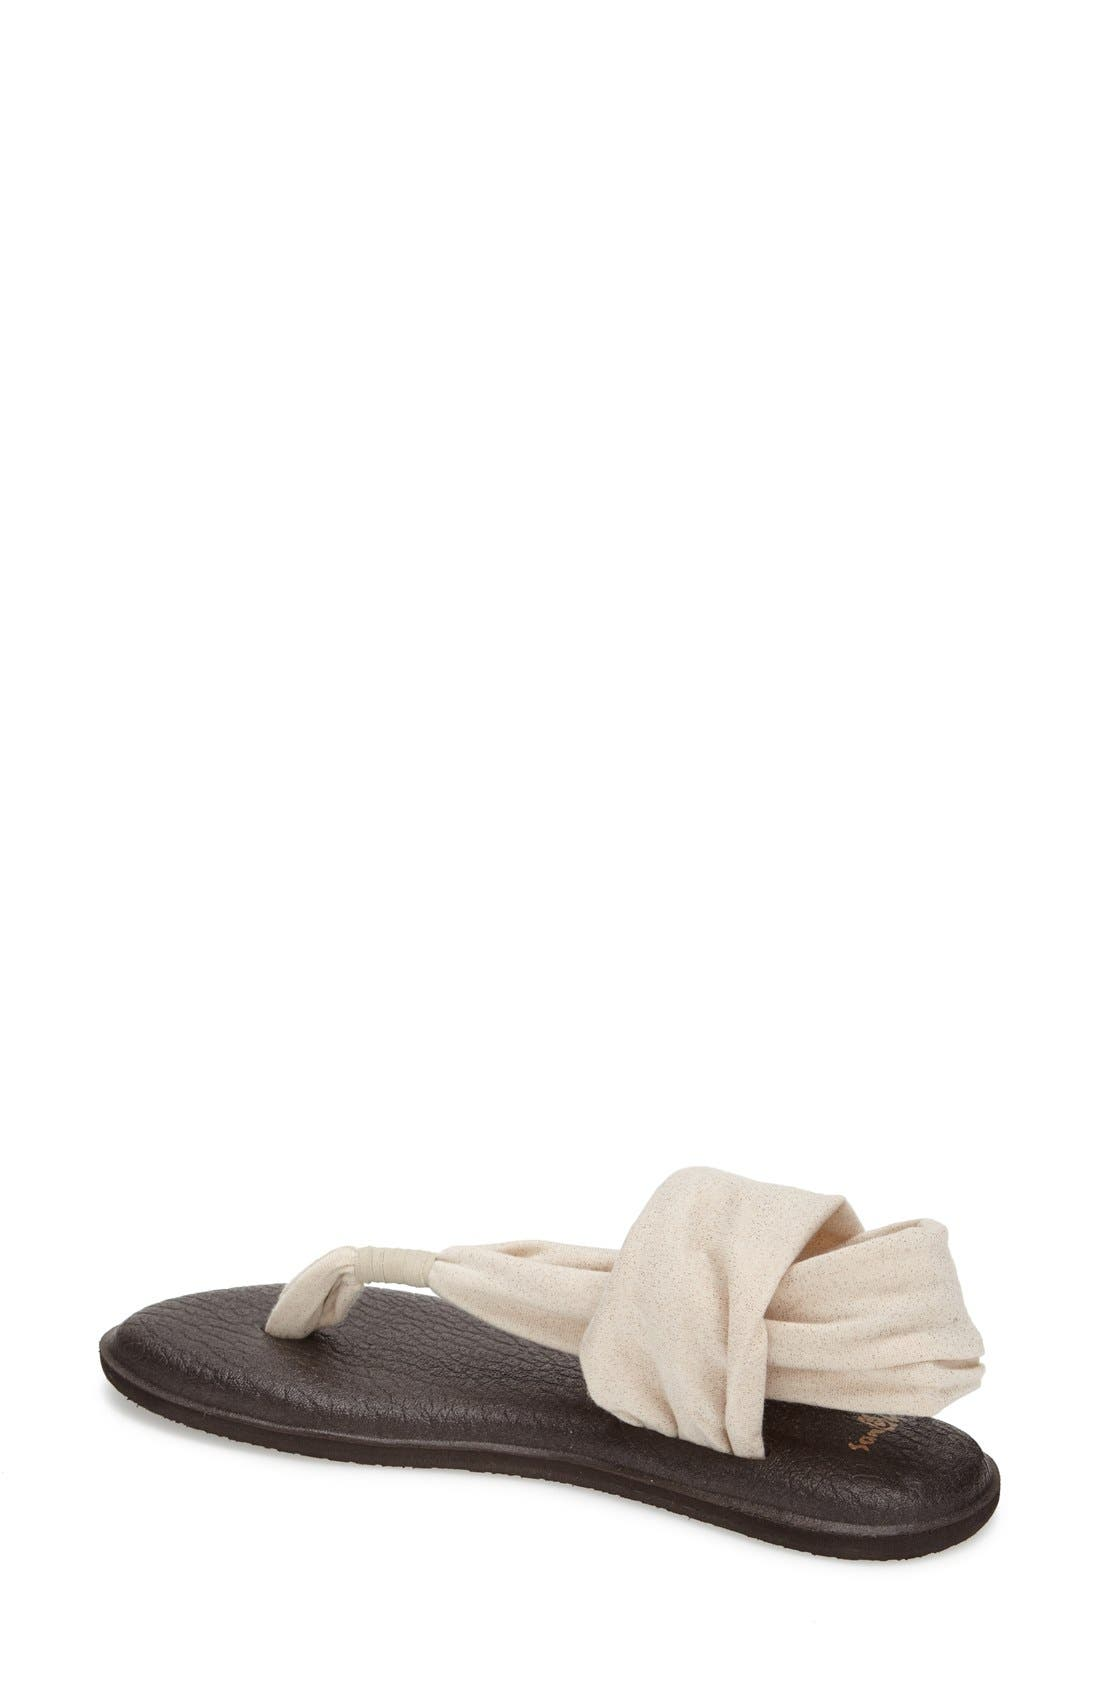 'Yoga Metallic Sling' Sandal,                             Alternate thumbnail 2, color,                             650